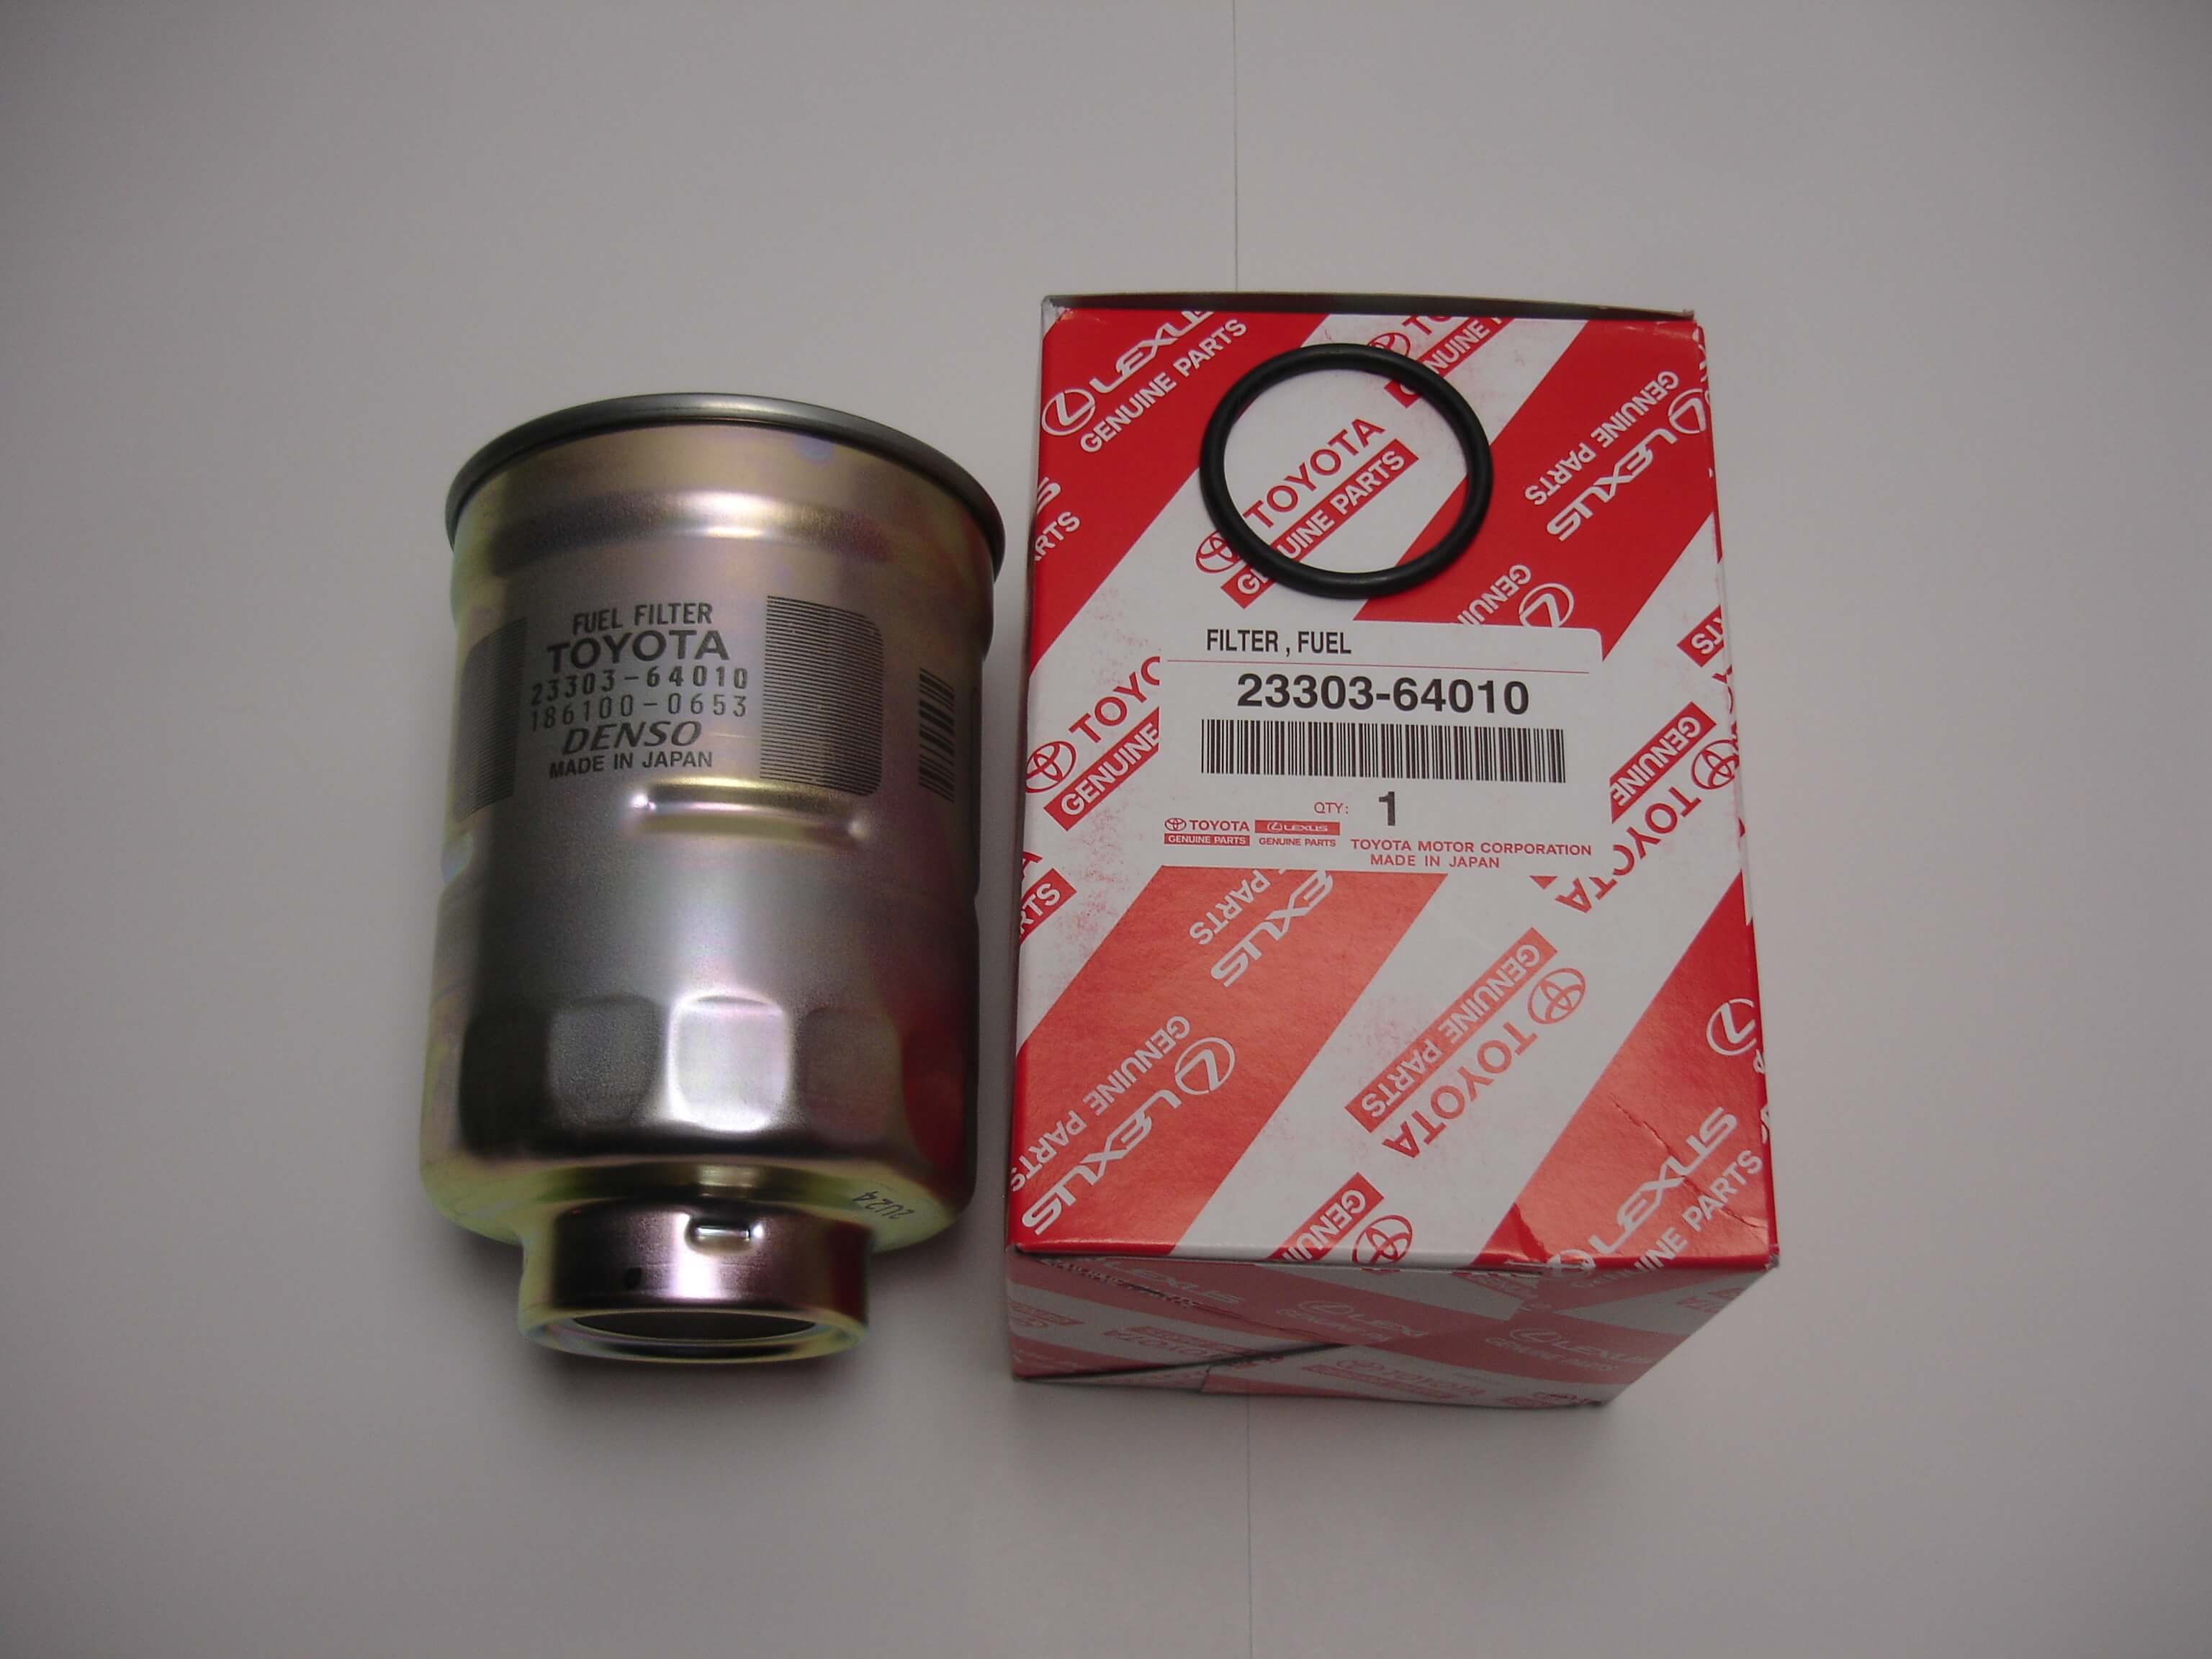 Toyota Fuel Filter Wiring Diagrams 2001 4runner Oem For 1kz 1kd 2kd Diesel Land Cruiser 4td